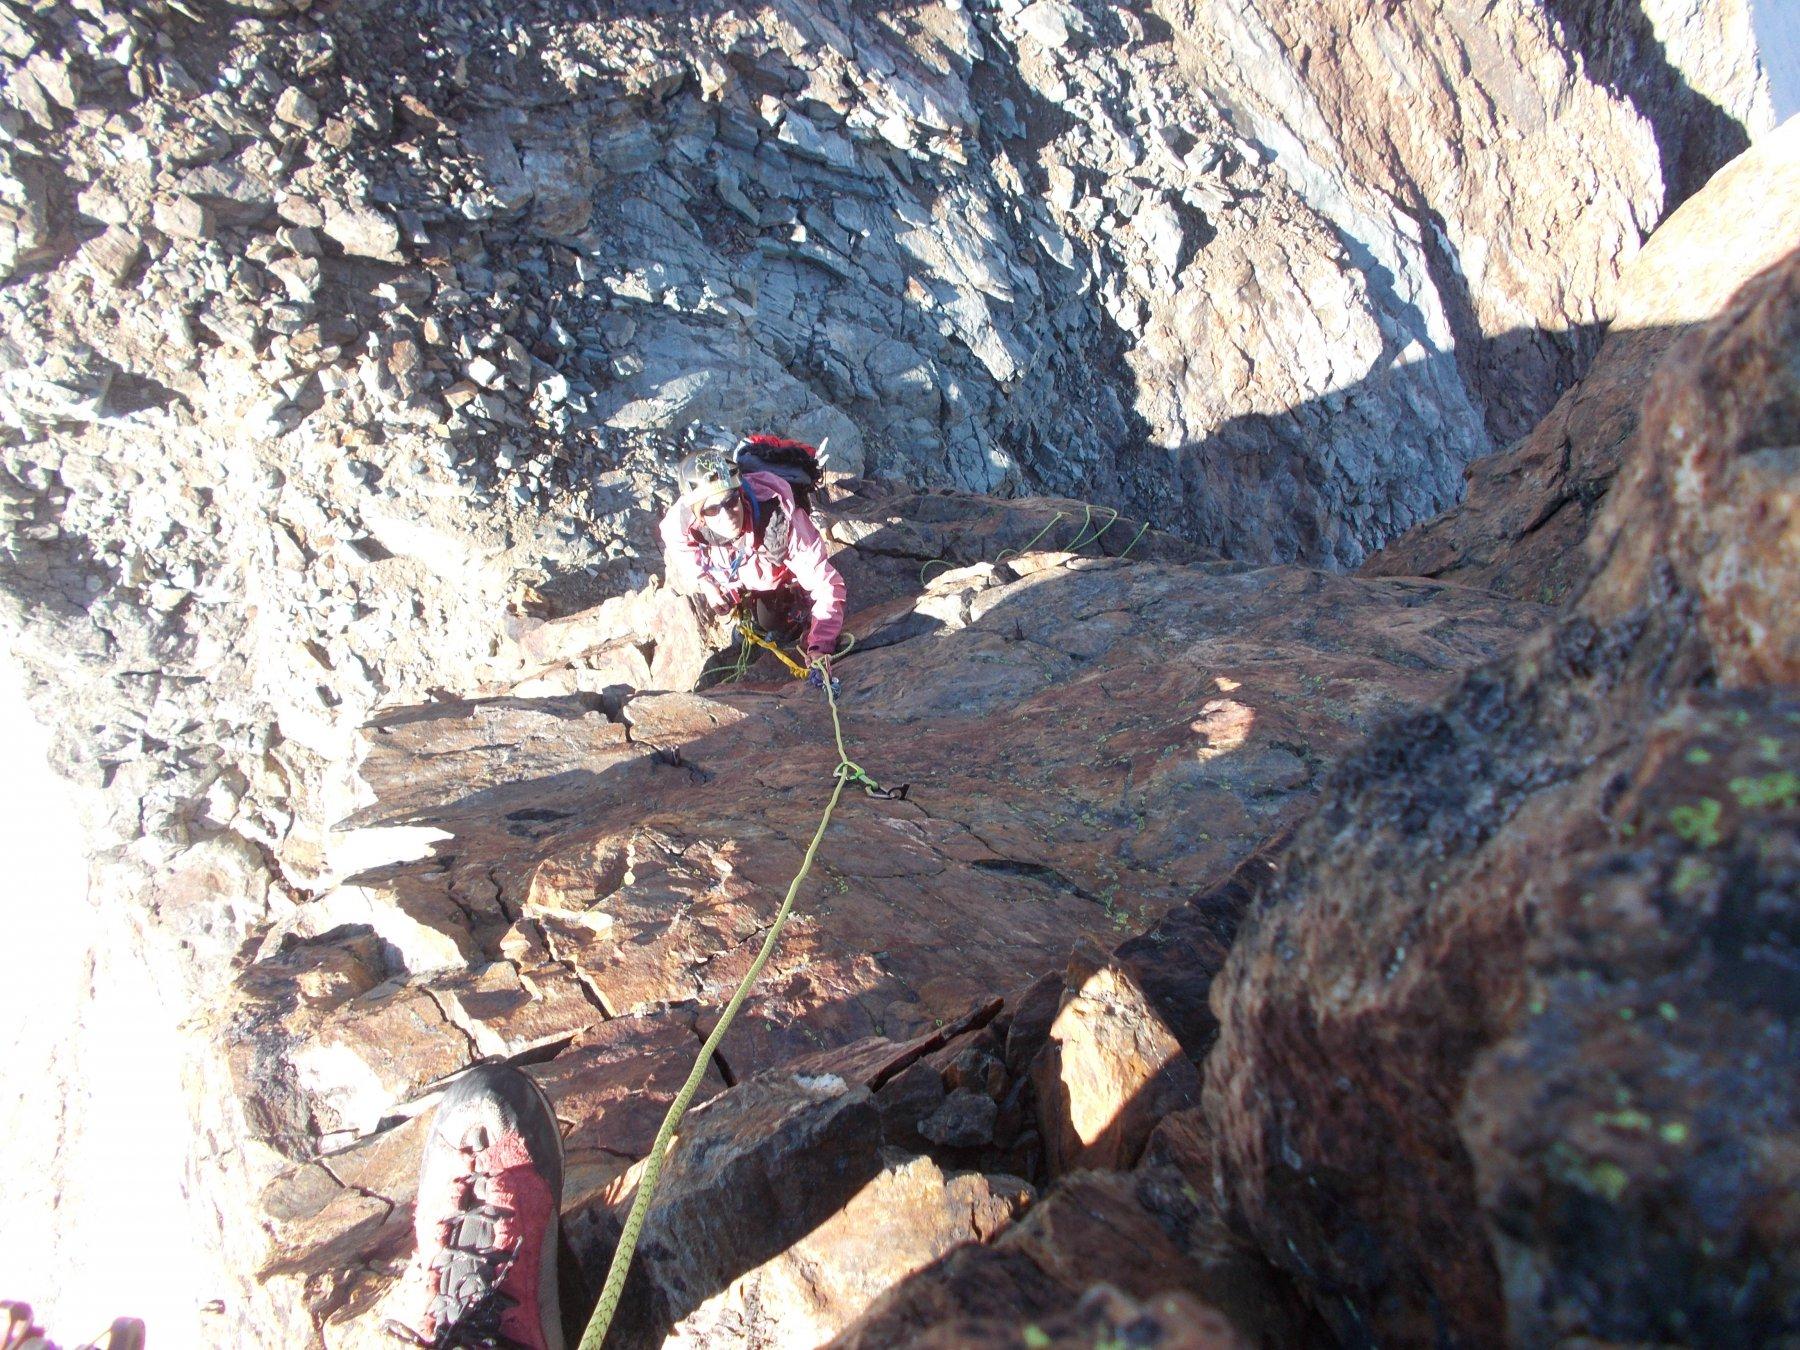 seconda fase..con arrampicata esposta..